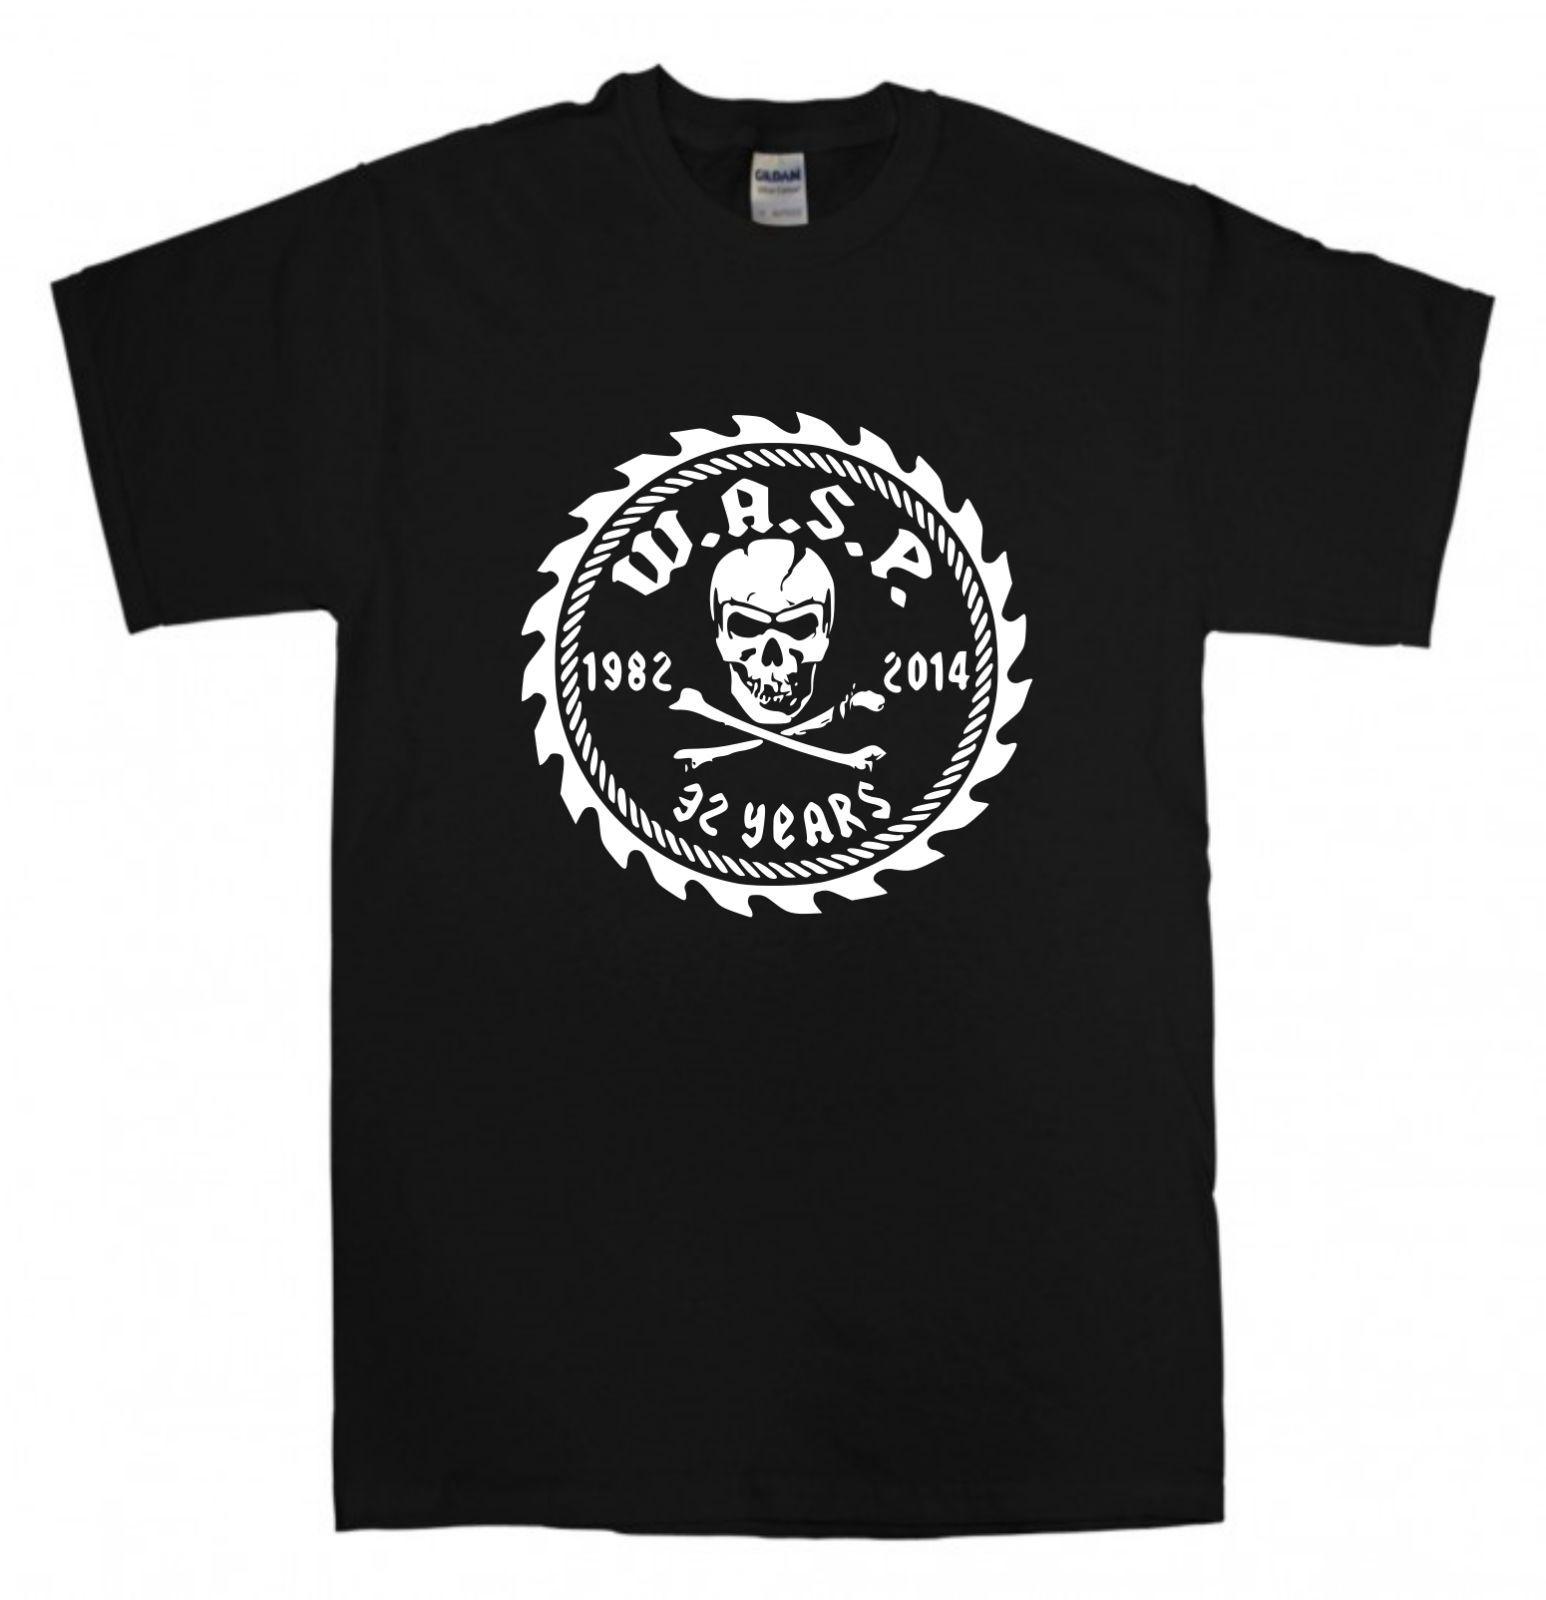 W.A.S.P. T-shirt New Black t shirt S-XXL WASP Band Heavy Metal 80s Judas Priest